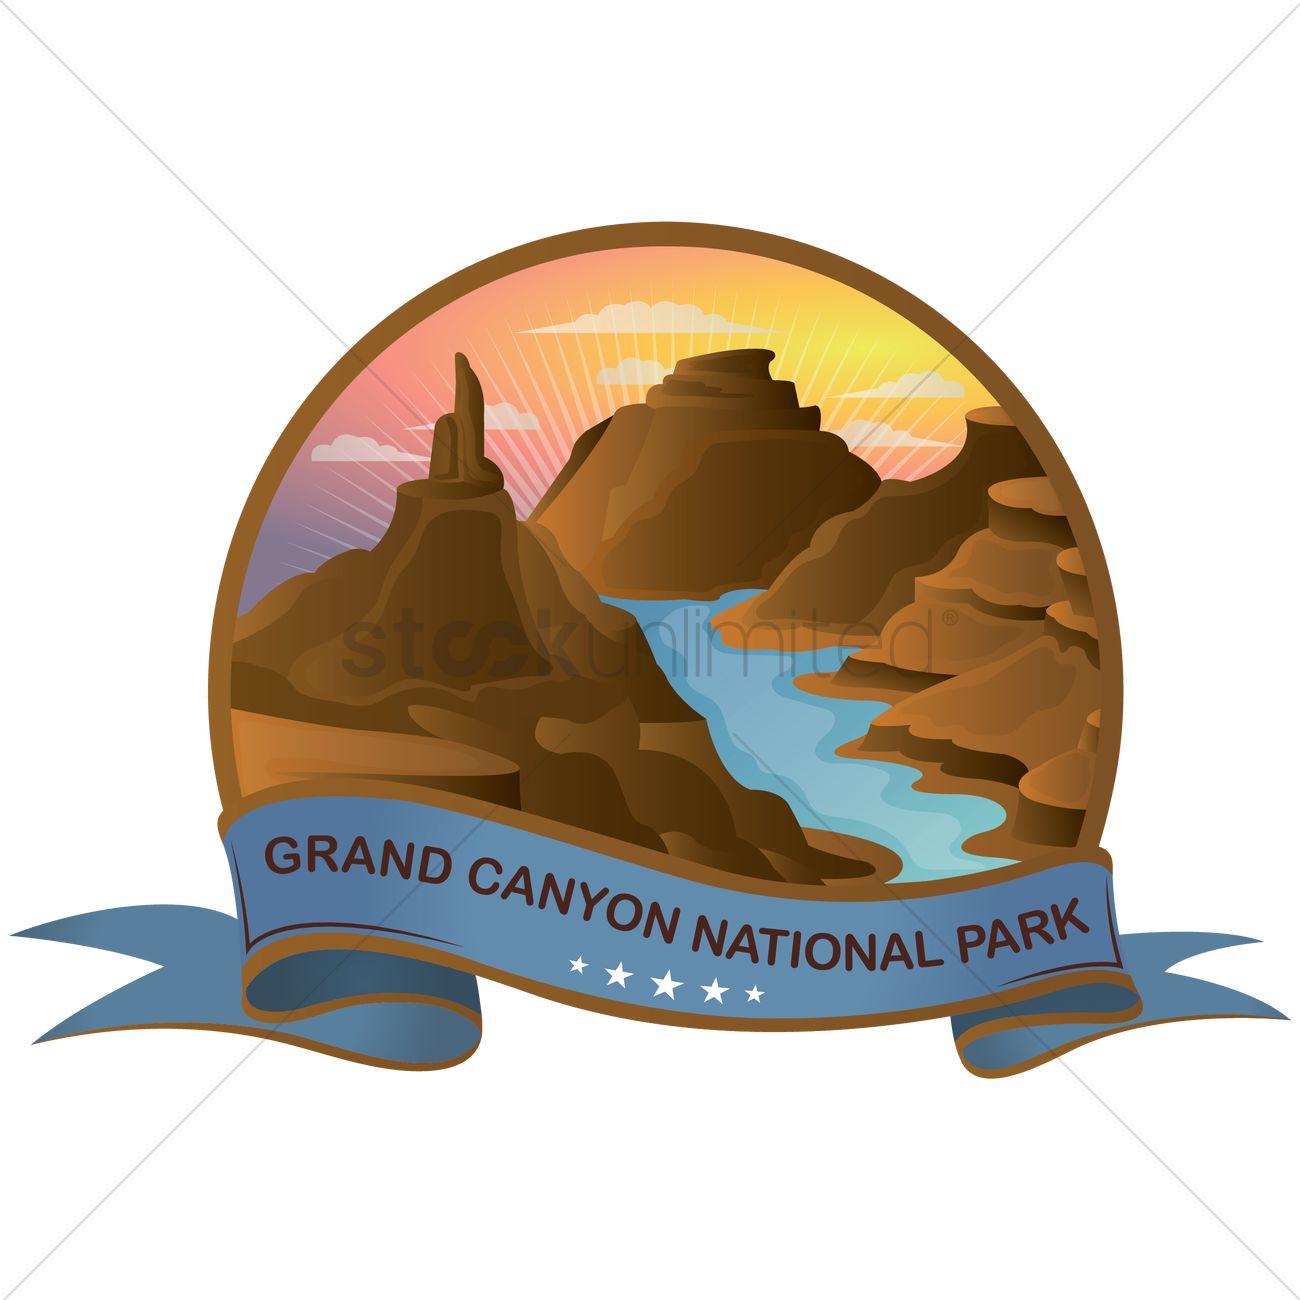 Grand canyon national park Vector Image.